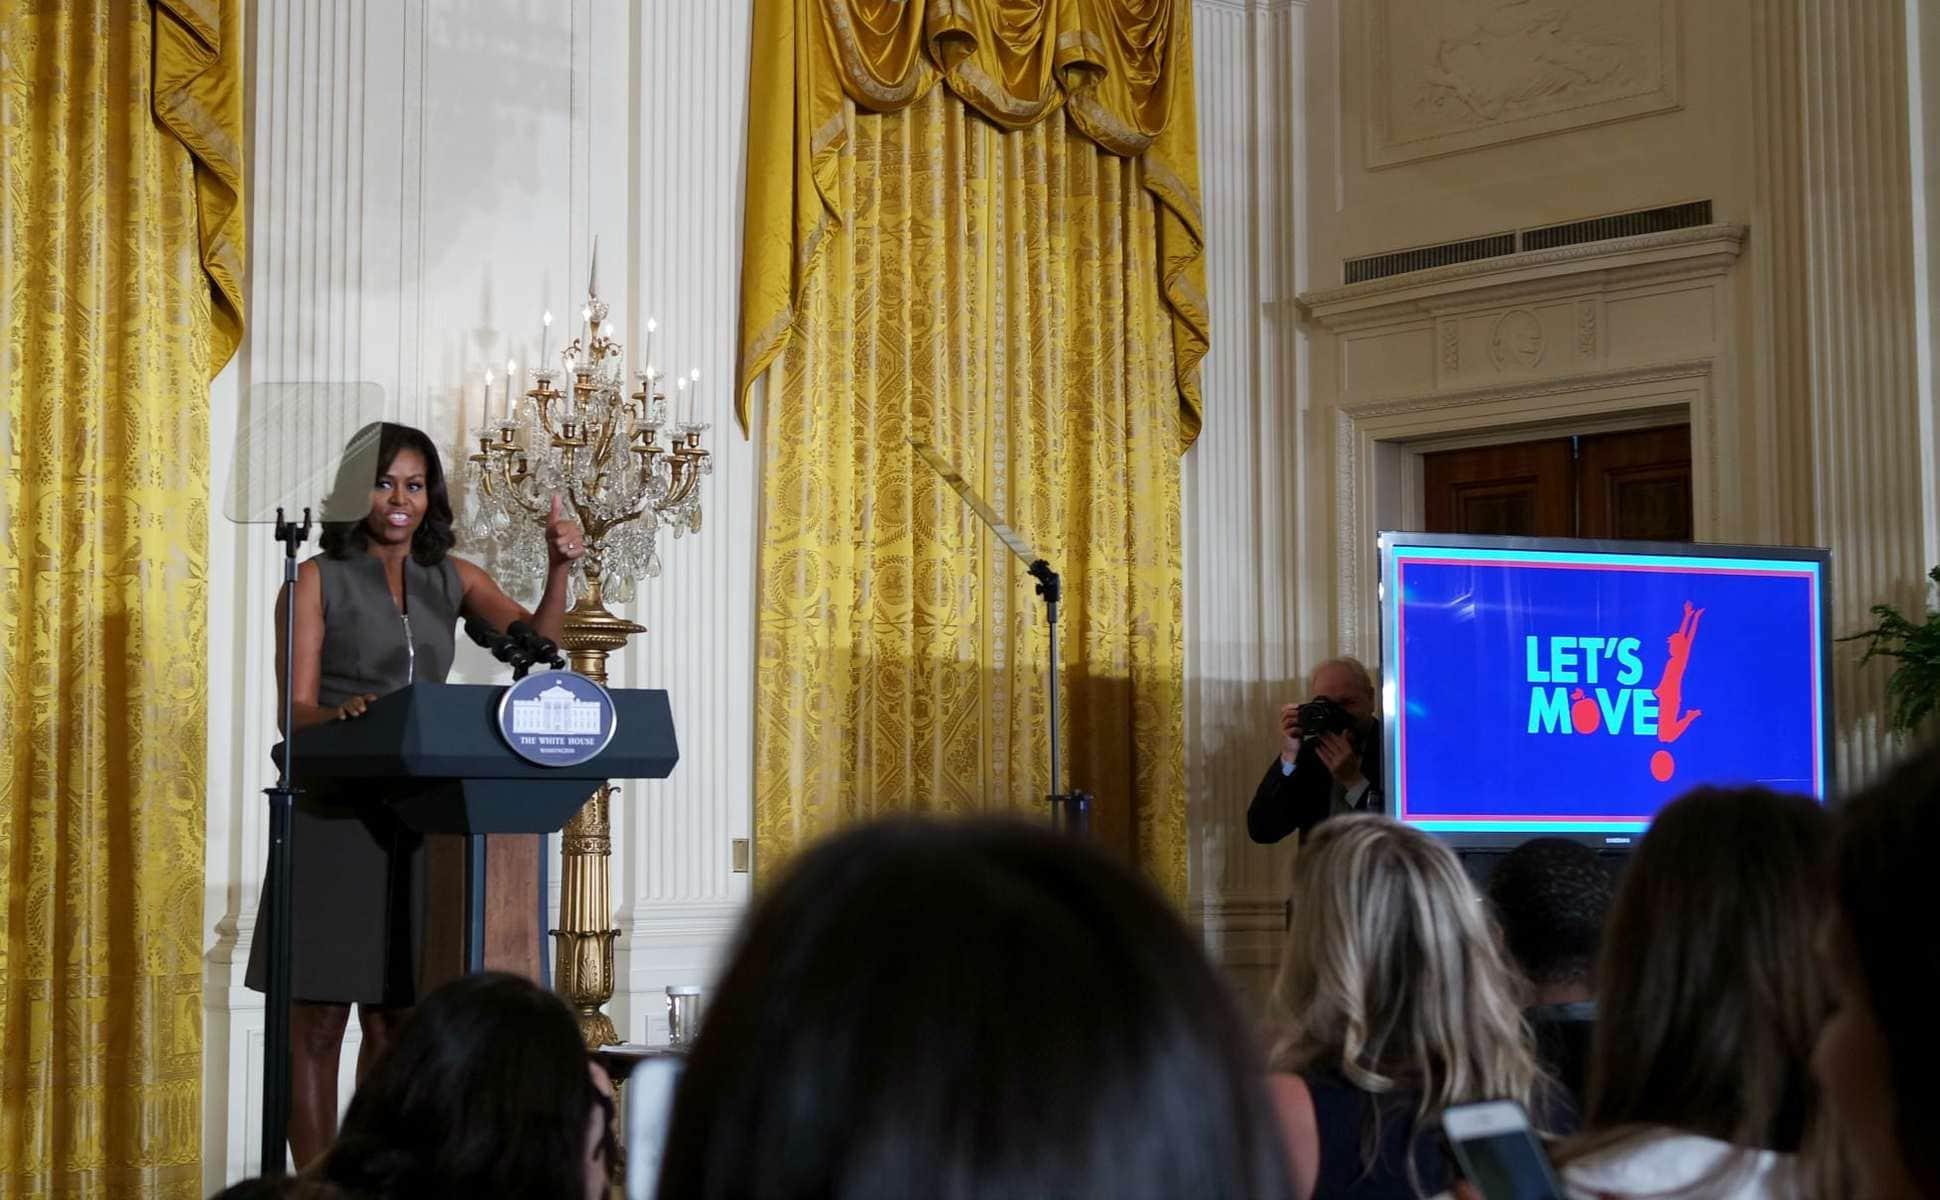 Michelle Obama, even more awesome in person!